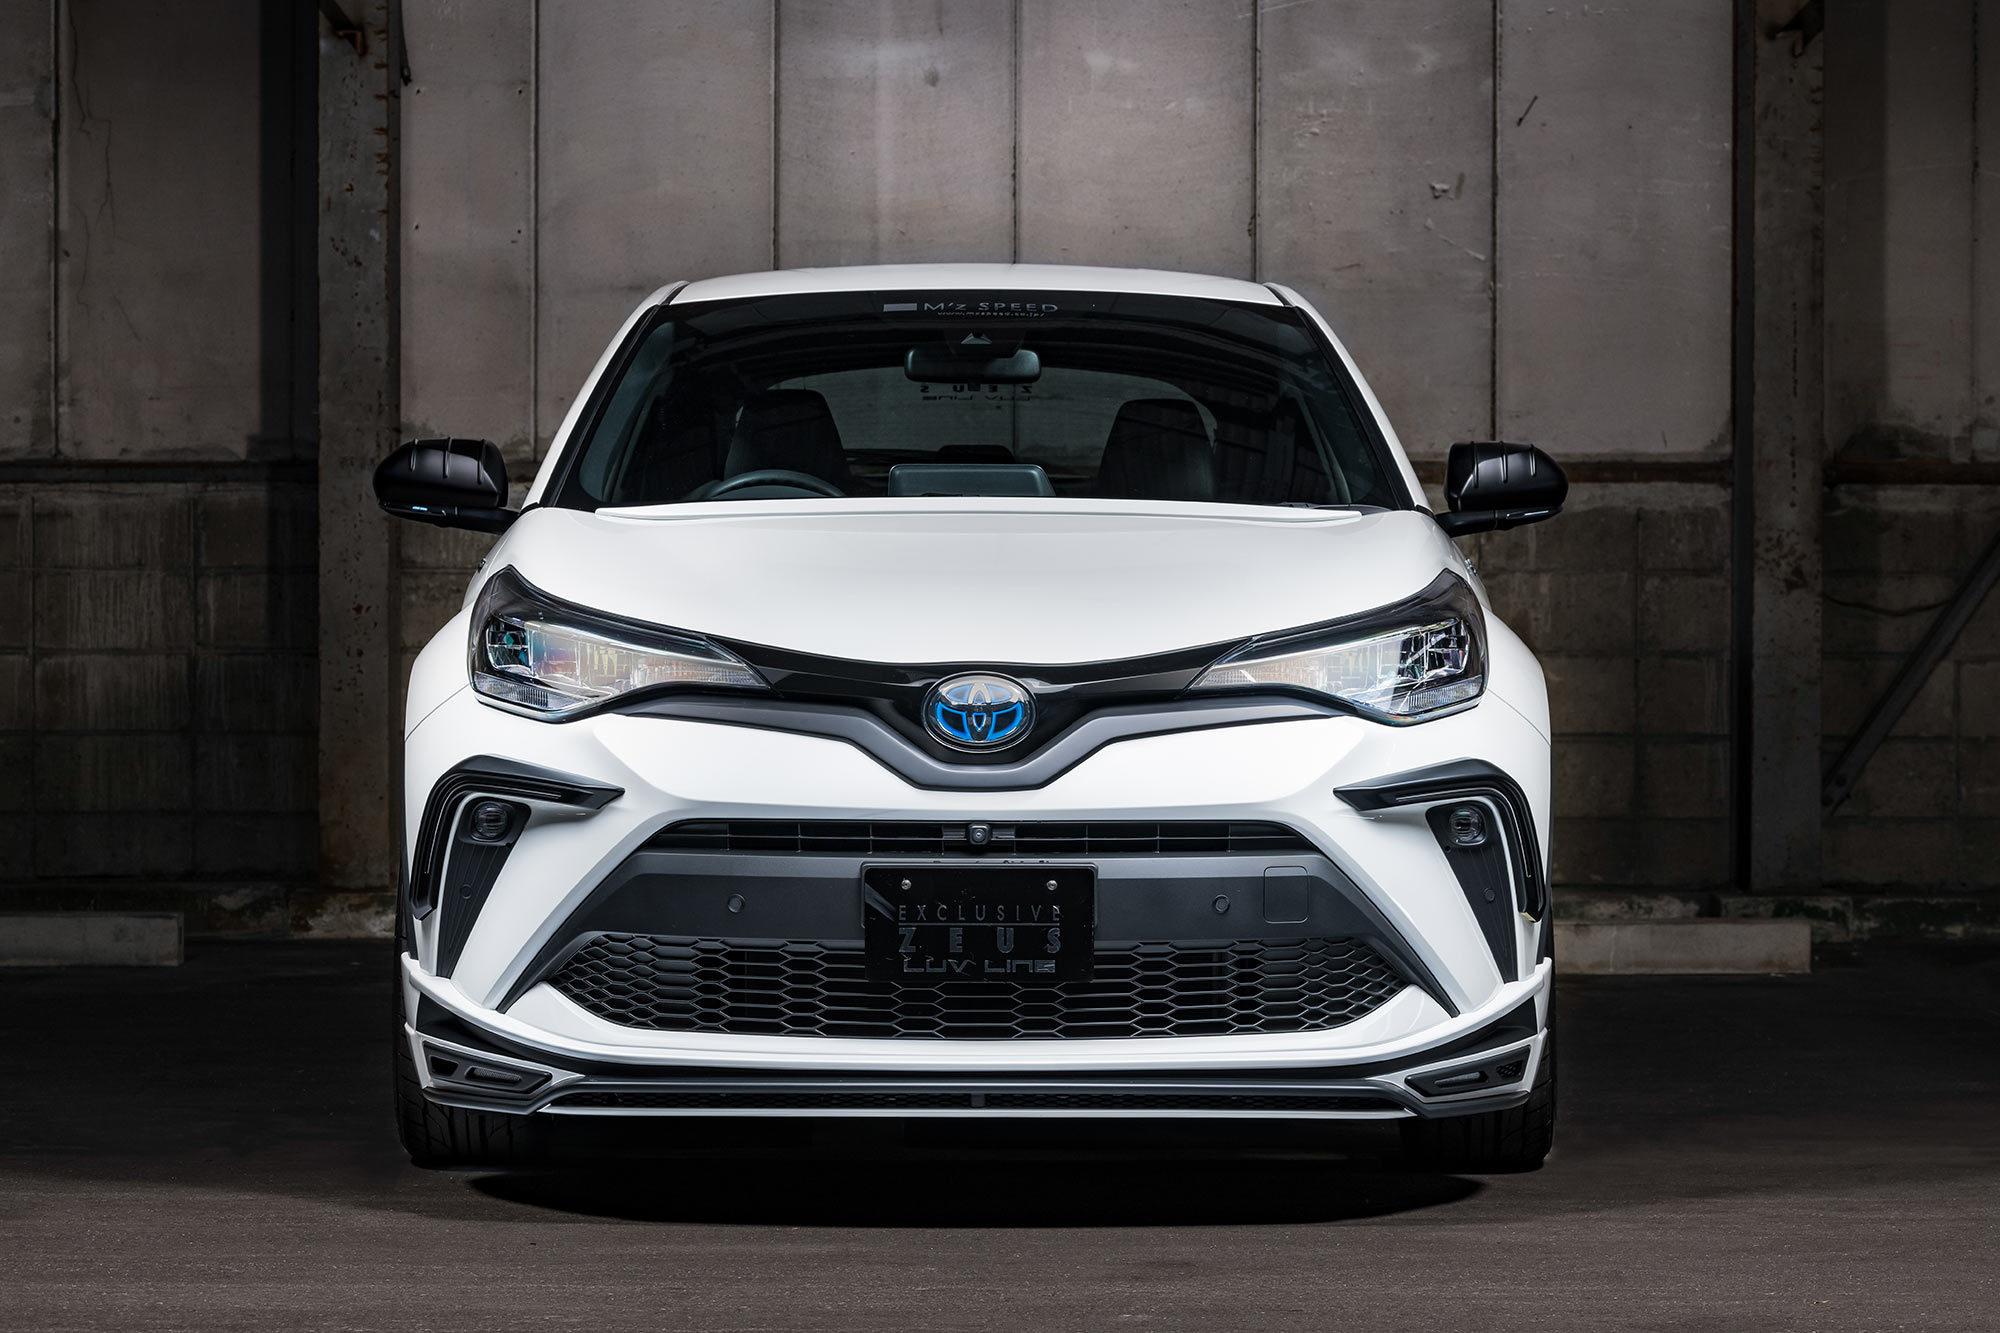 M'z Speed body kit for Toyota C-HR ABS Plastic